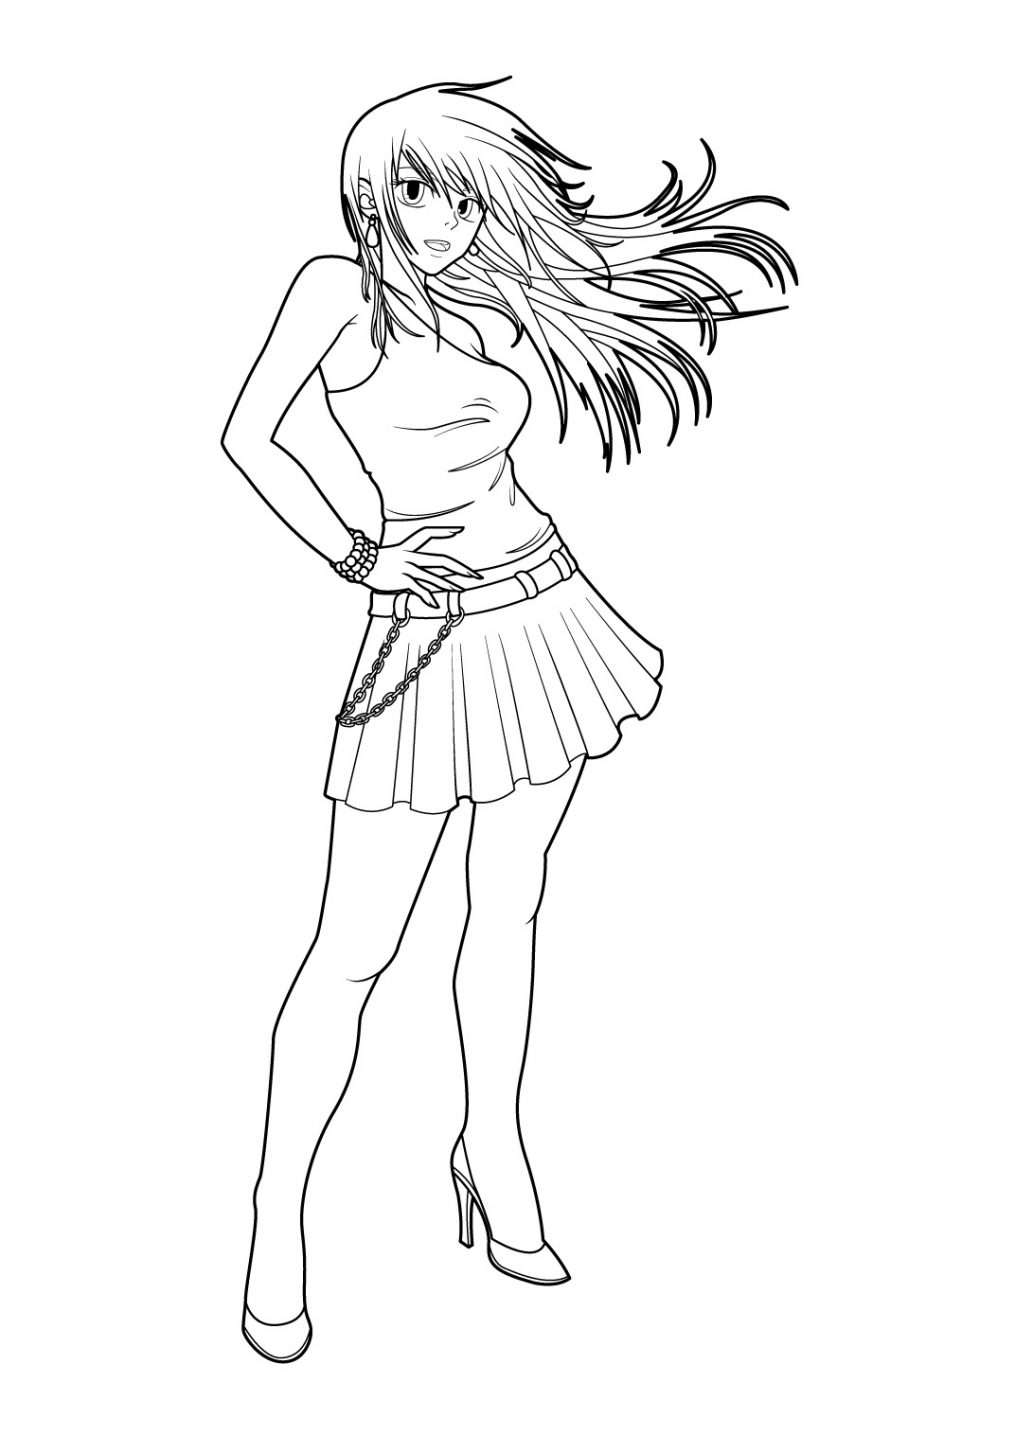 Comment dessiner des personnages de manga - Manga dessin a imprimer ...